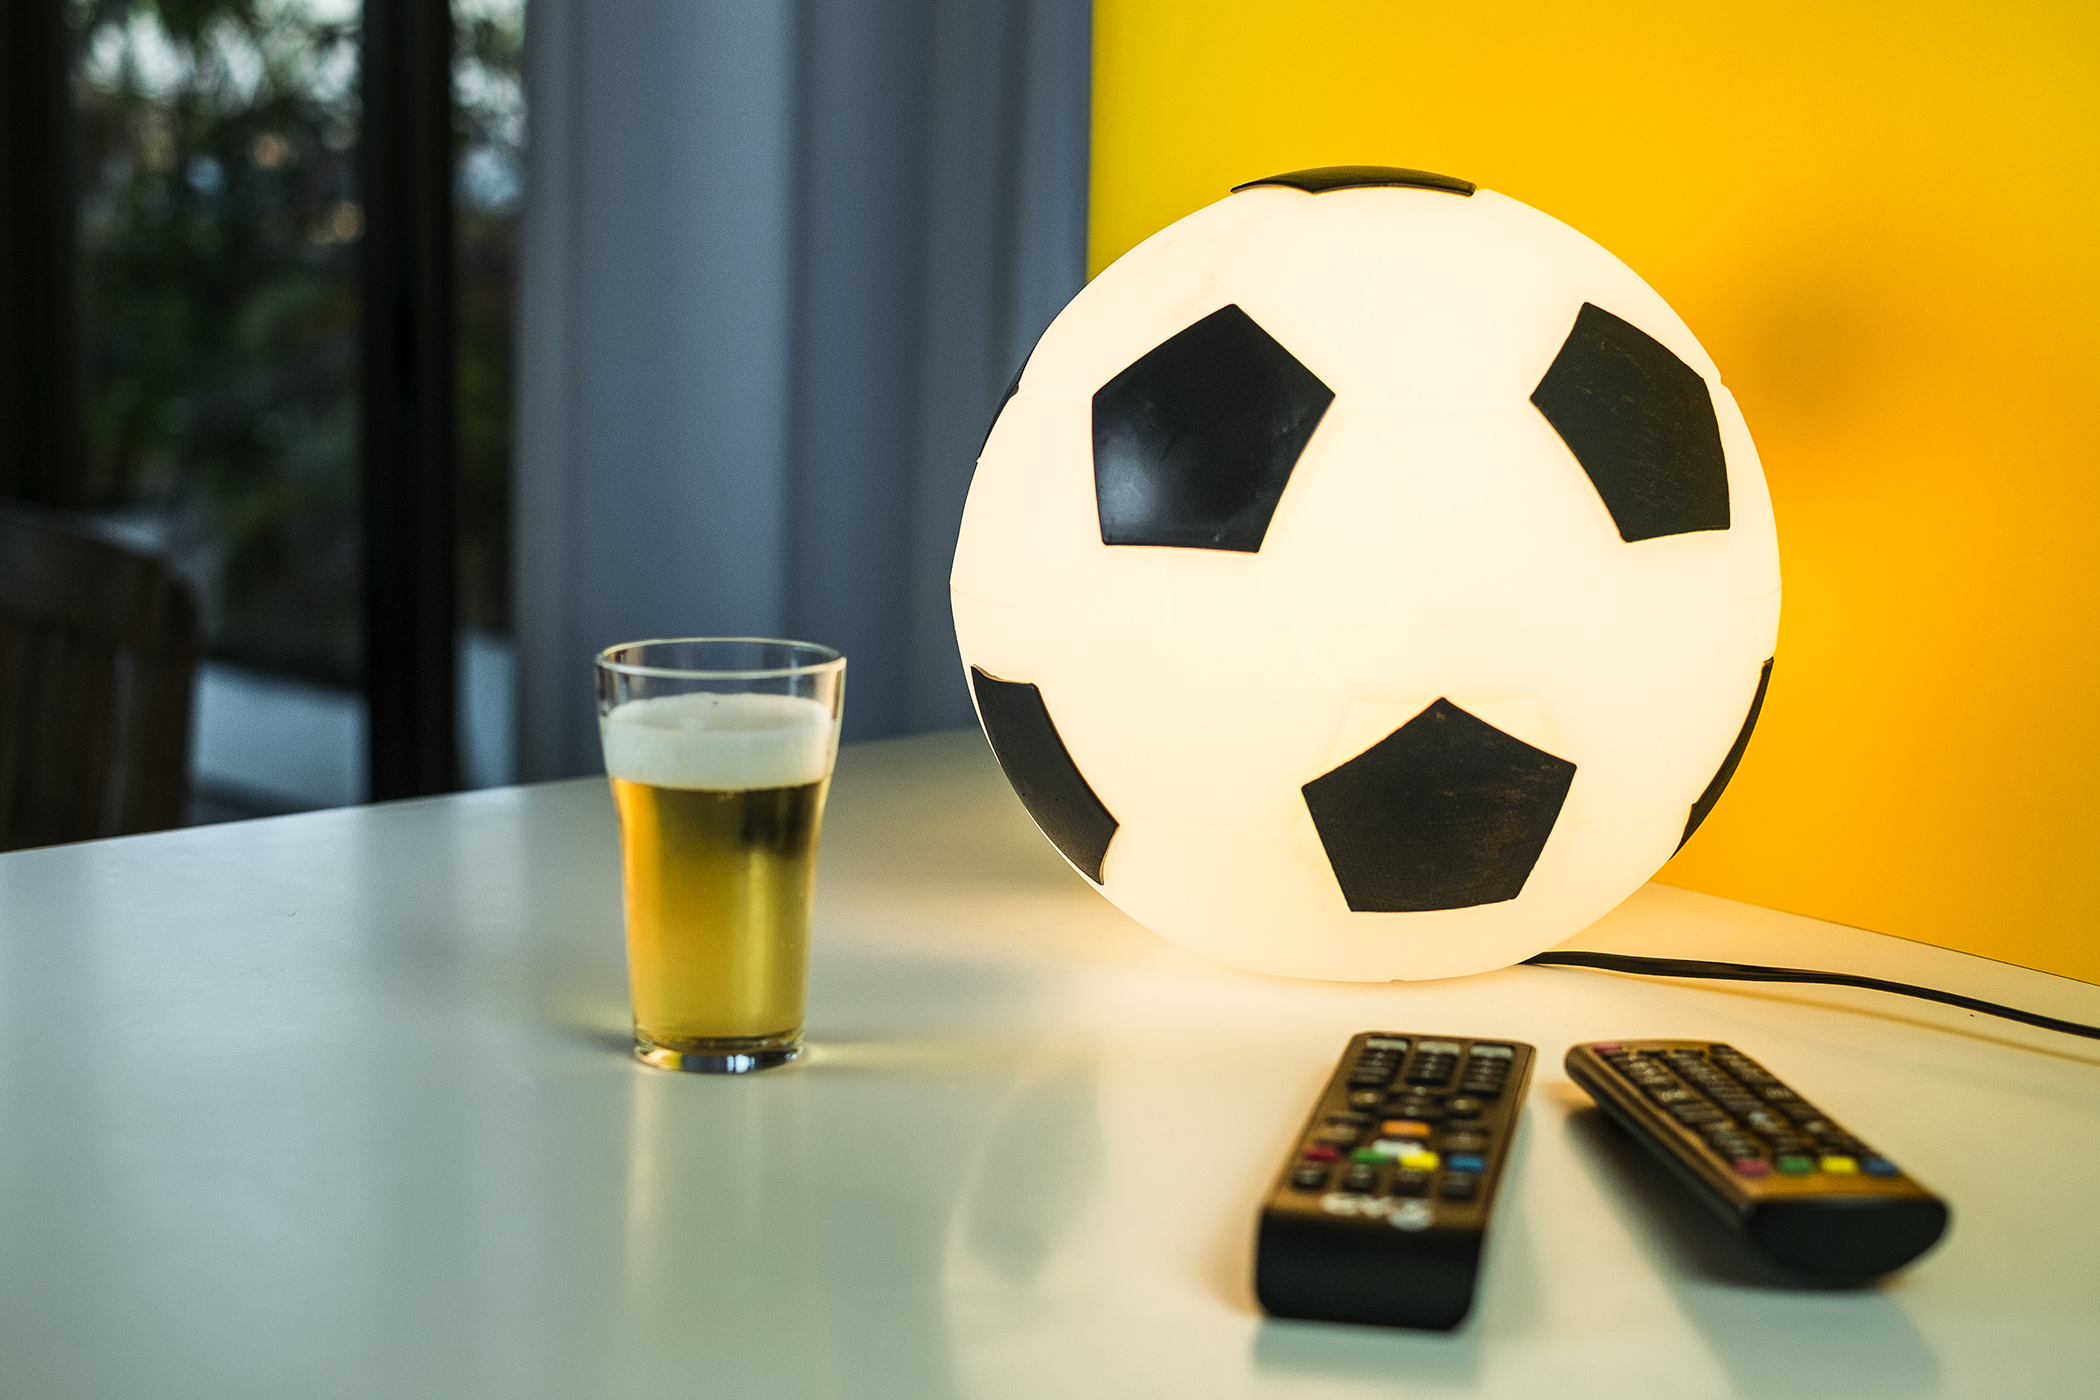 luminaria_criativa_bola_de_futebol_usare_fundesign